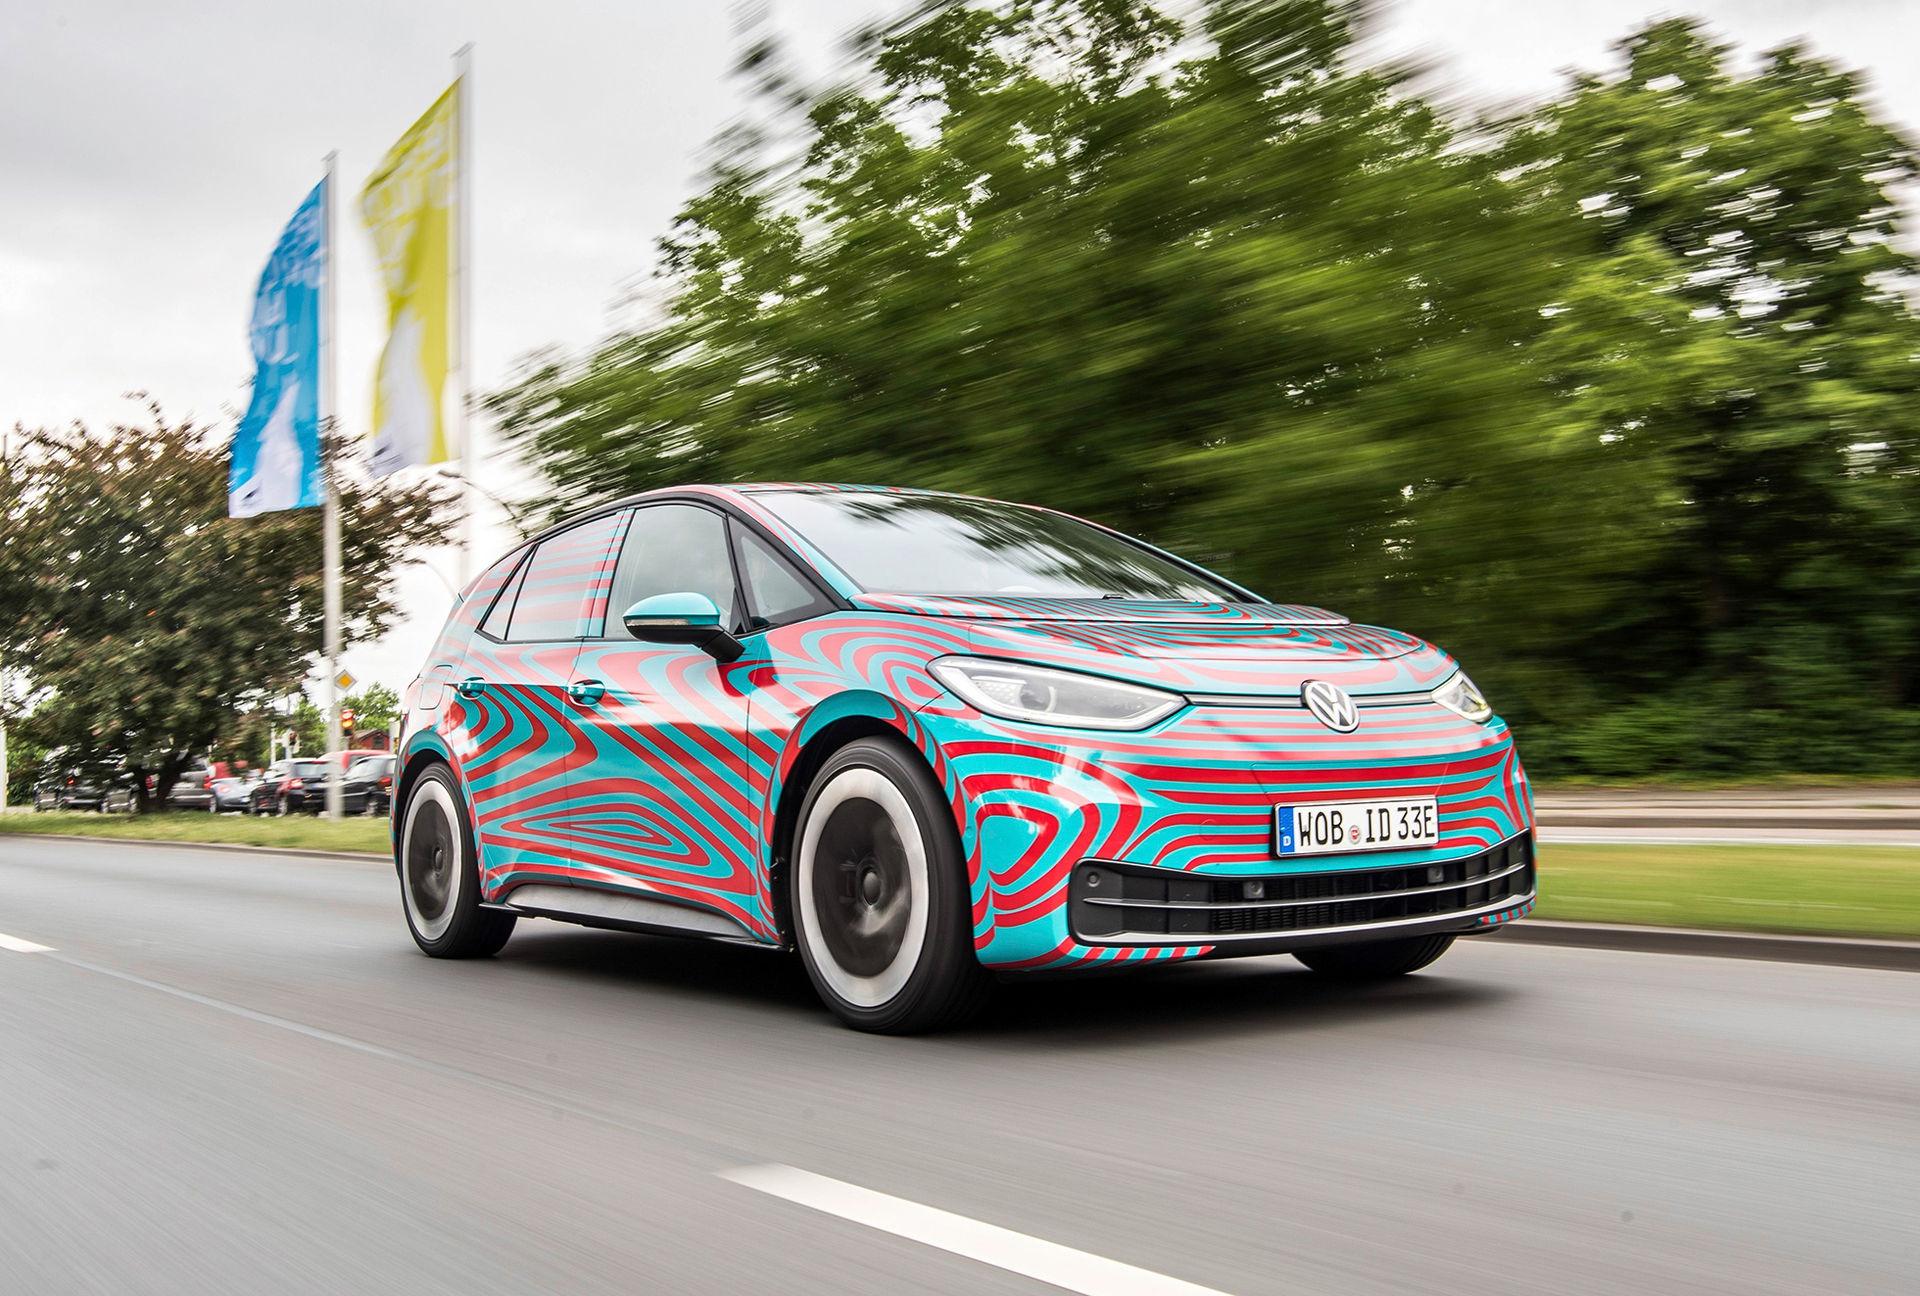 Snart presenterar Volkswagen eldrivna ID.3